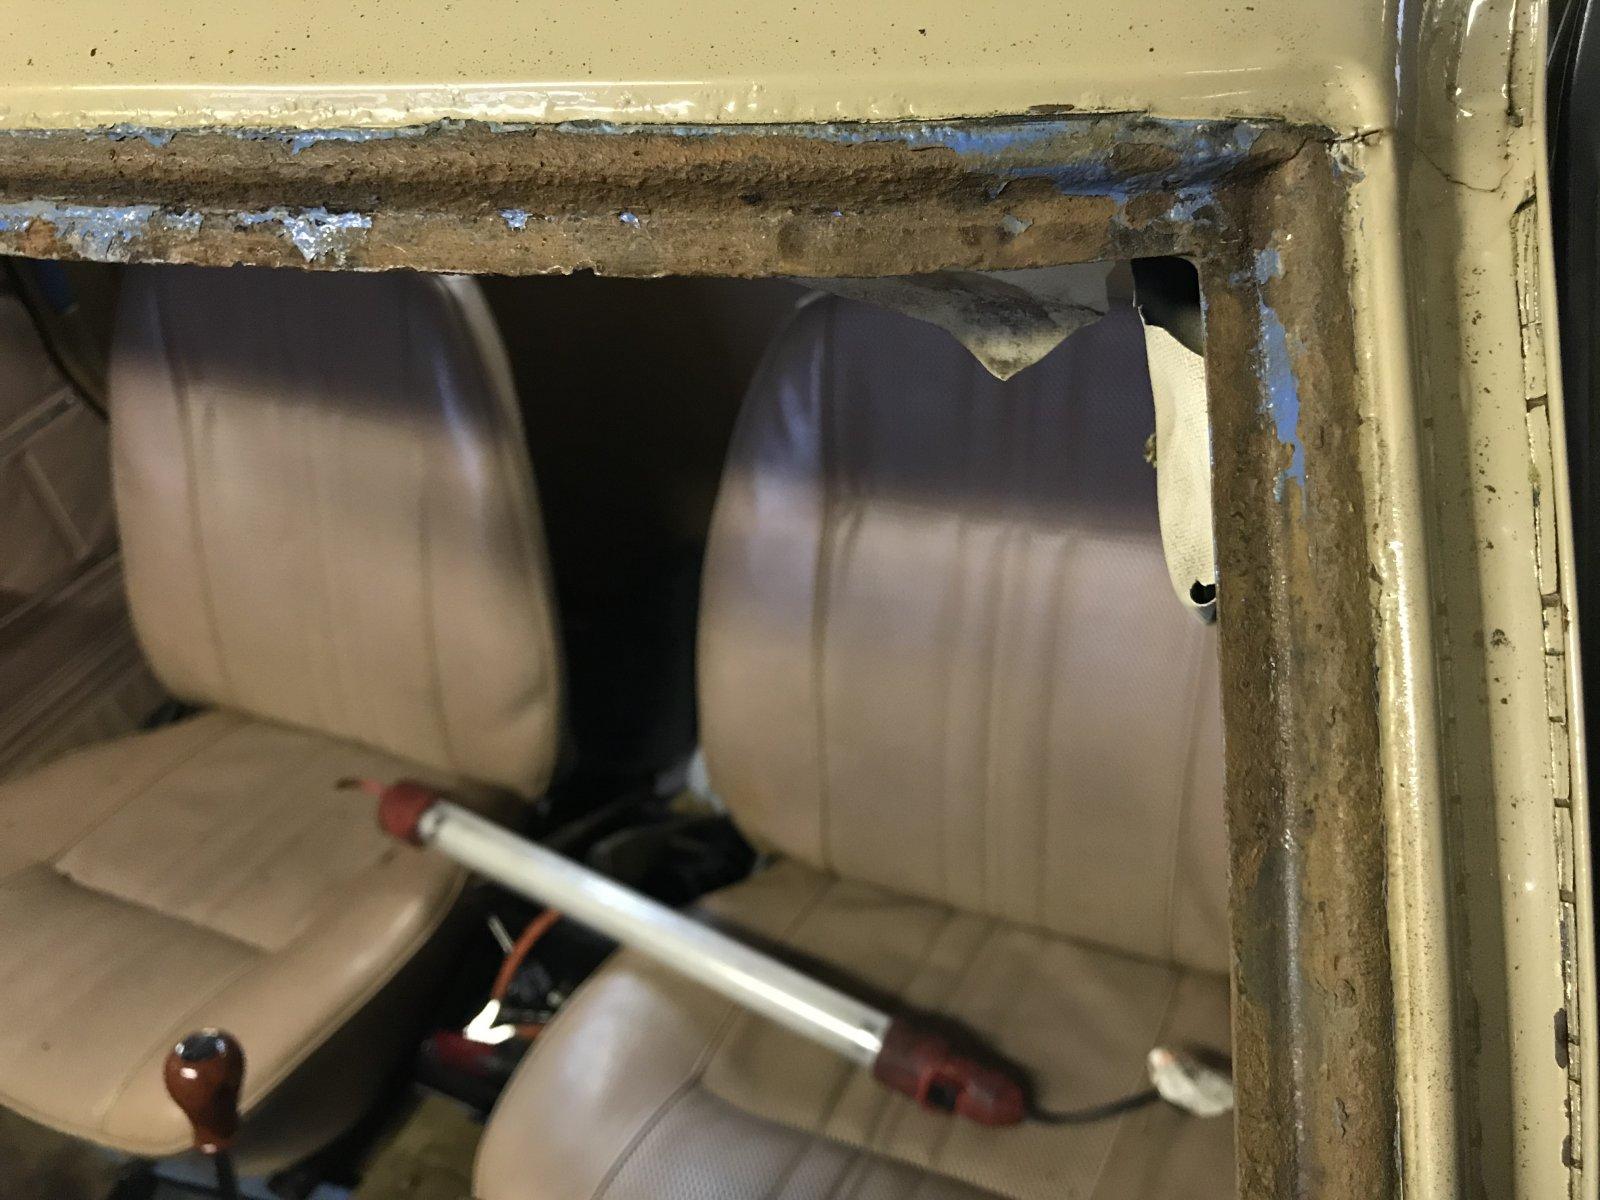 12282017 bruiser windshield and dash (4).JPG